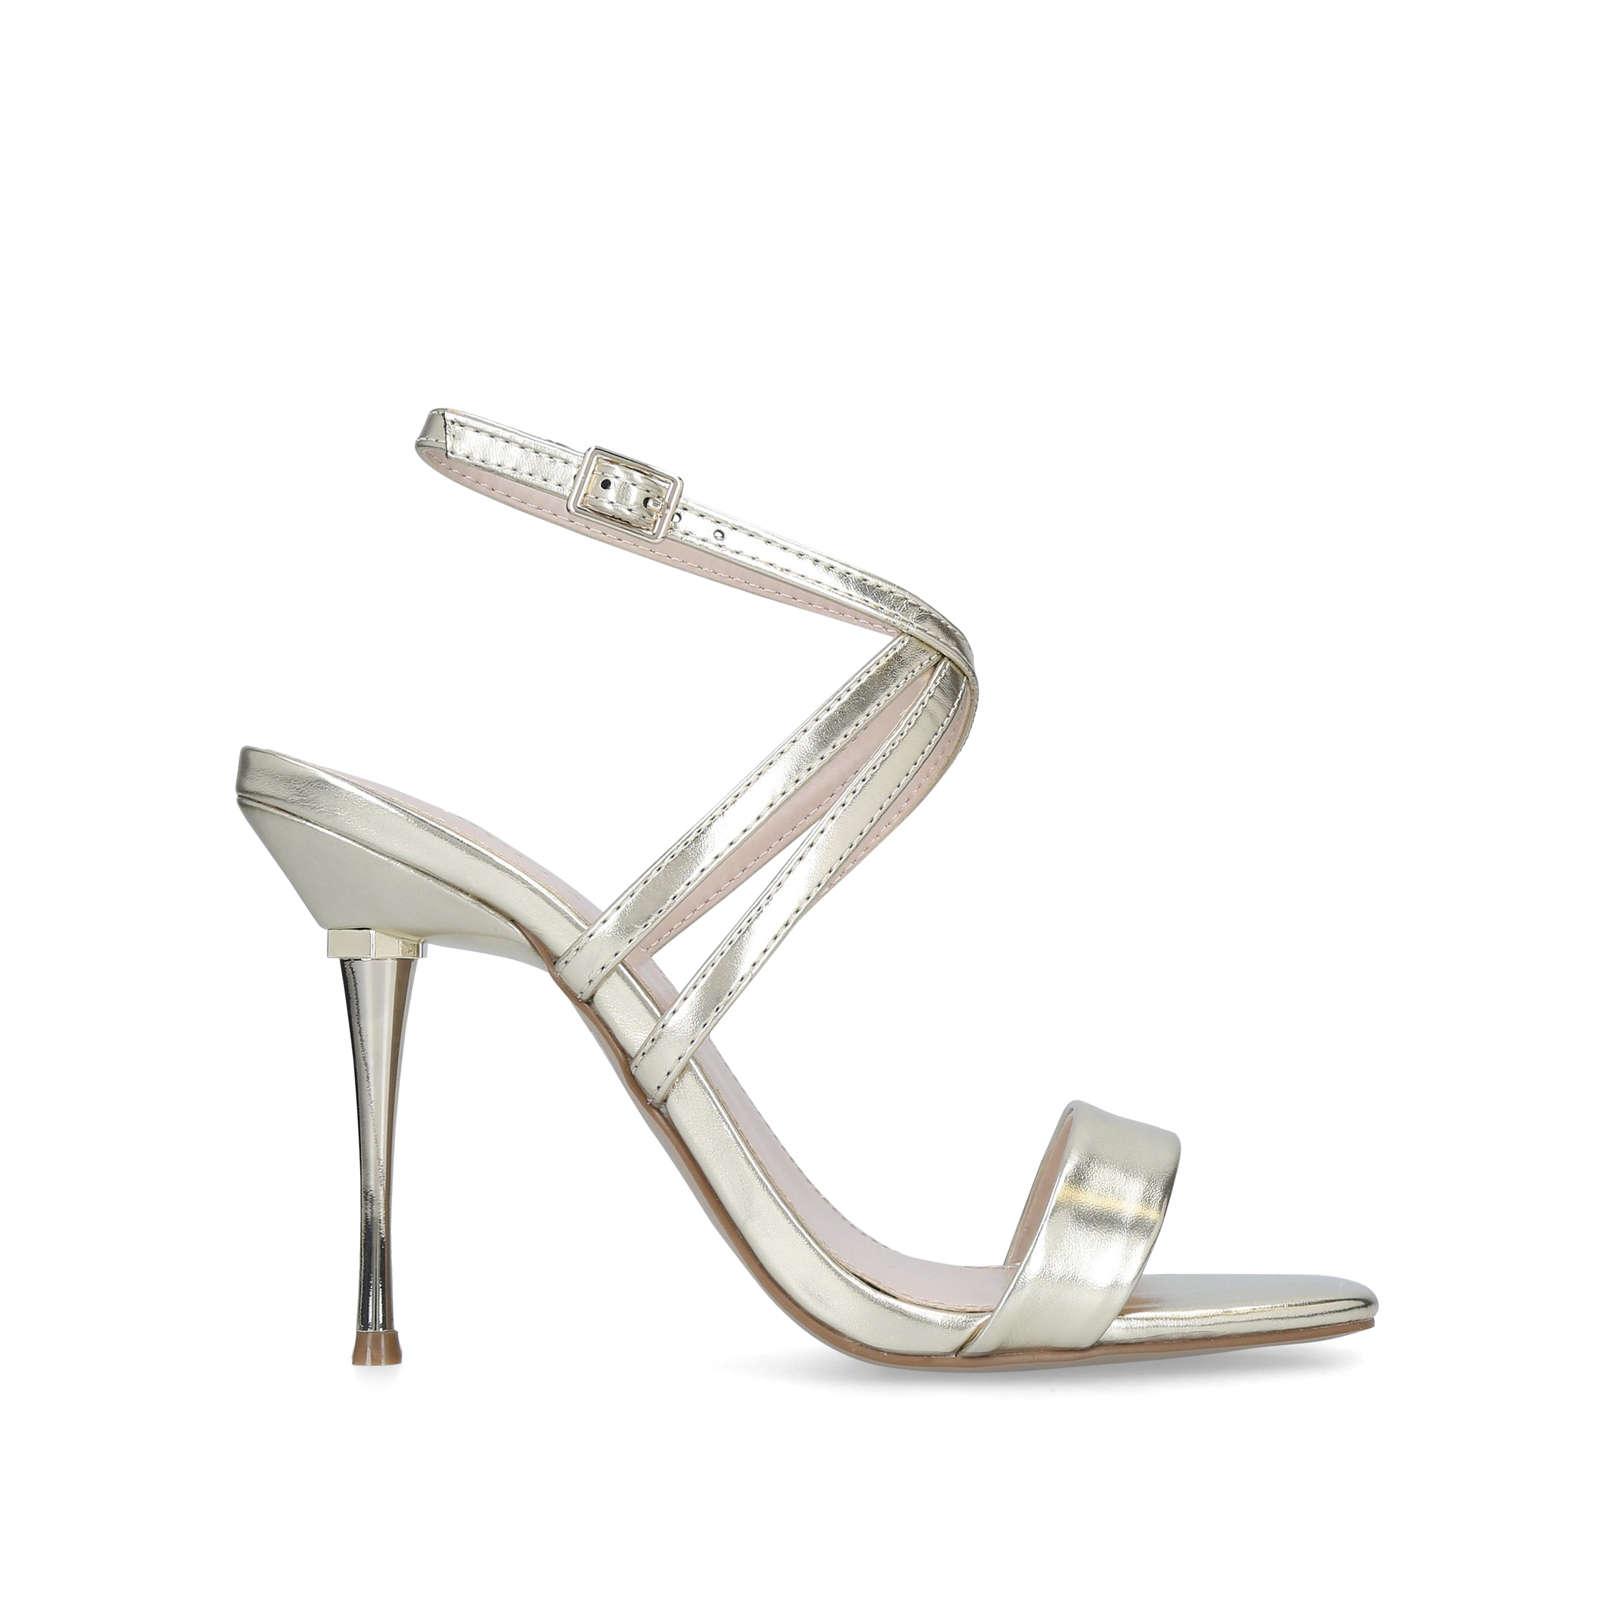 7d23302c27f Goldi Stiletto Heel Strappy Sandals